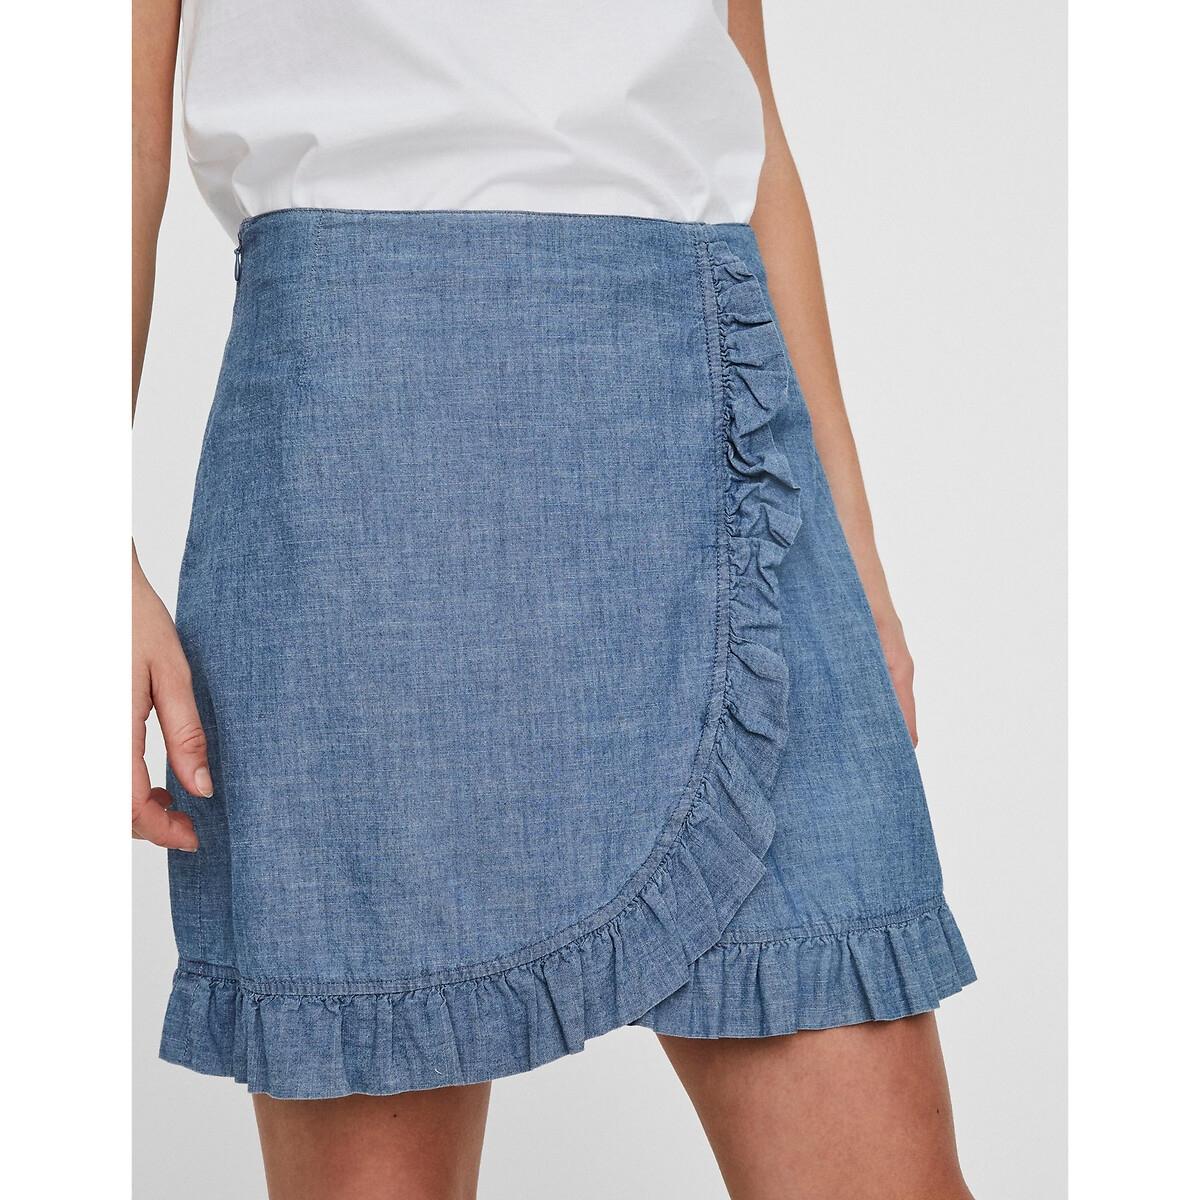 Фото - Юбка LaRedoute С эффектом запаха джинсовая L синий юбка laredoute джинсовая прямого покроя xs синий